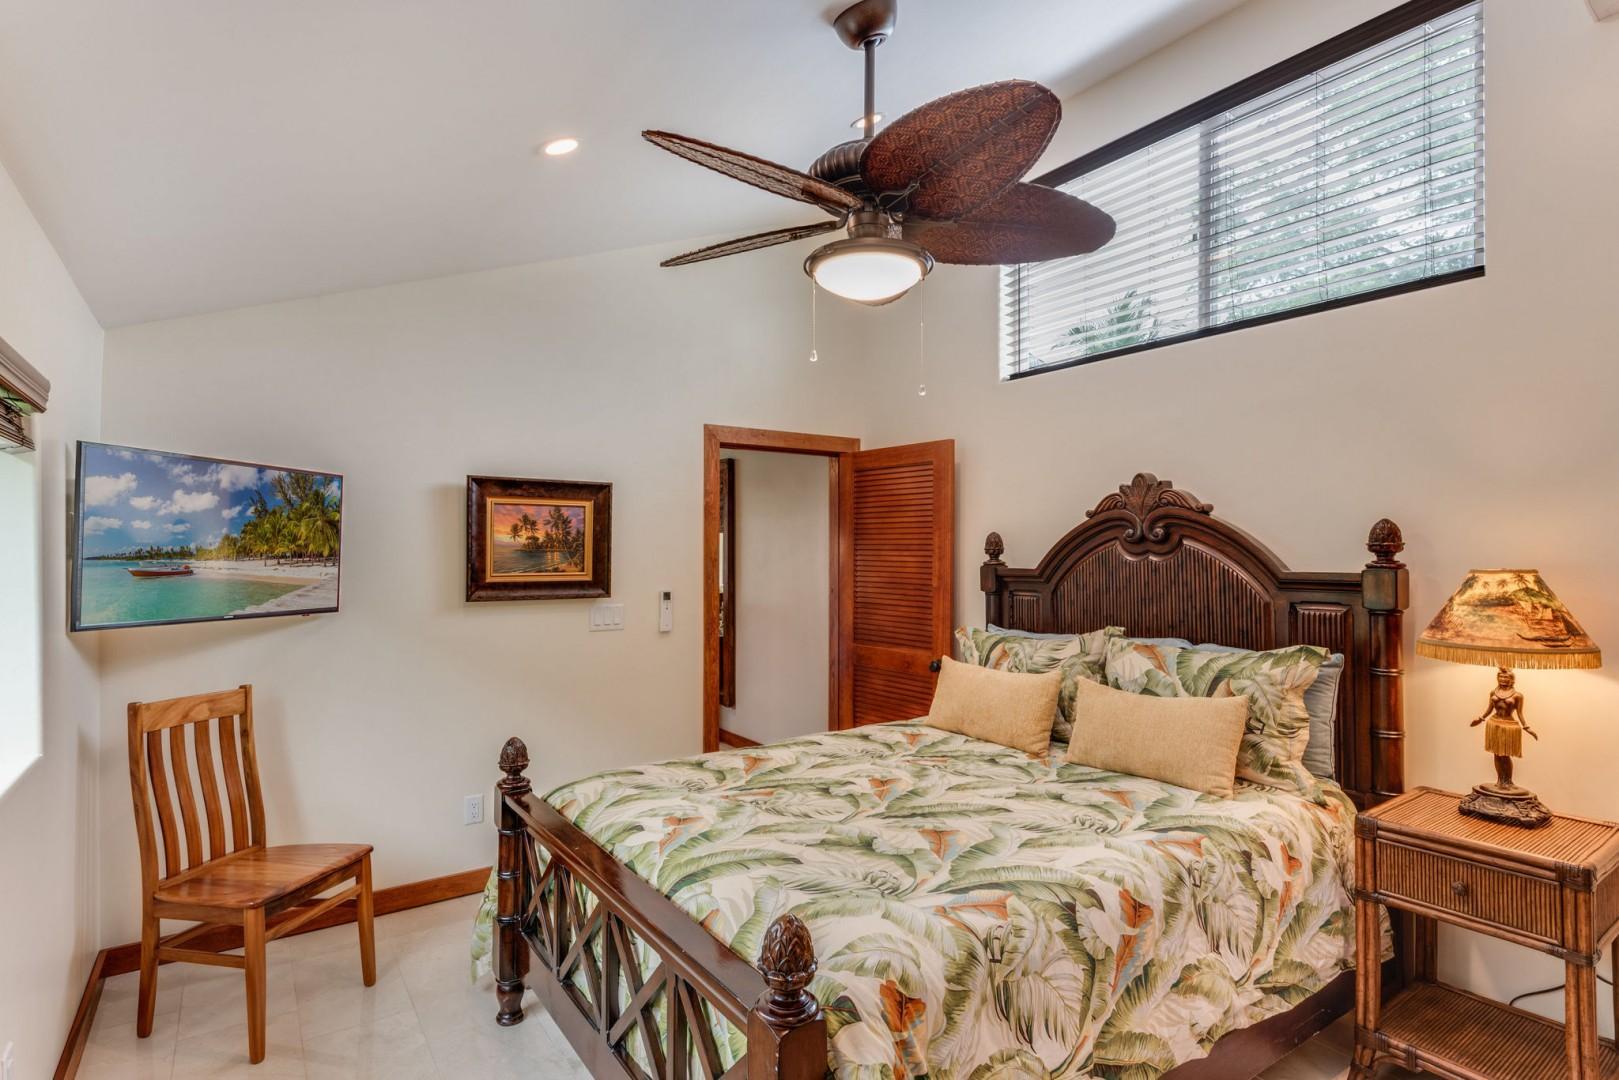 Guest bedroom in Hale Lihikai